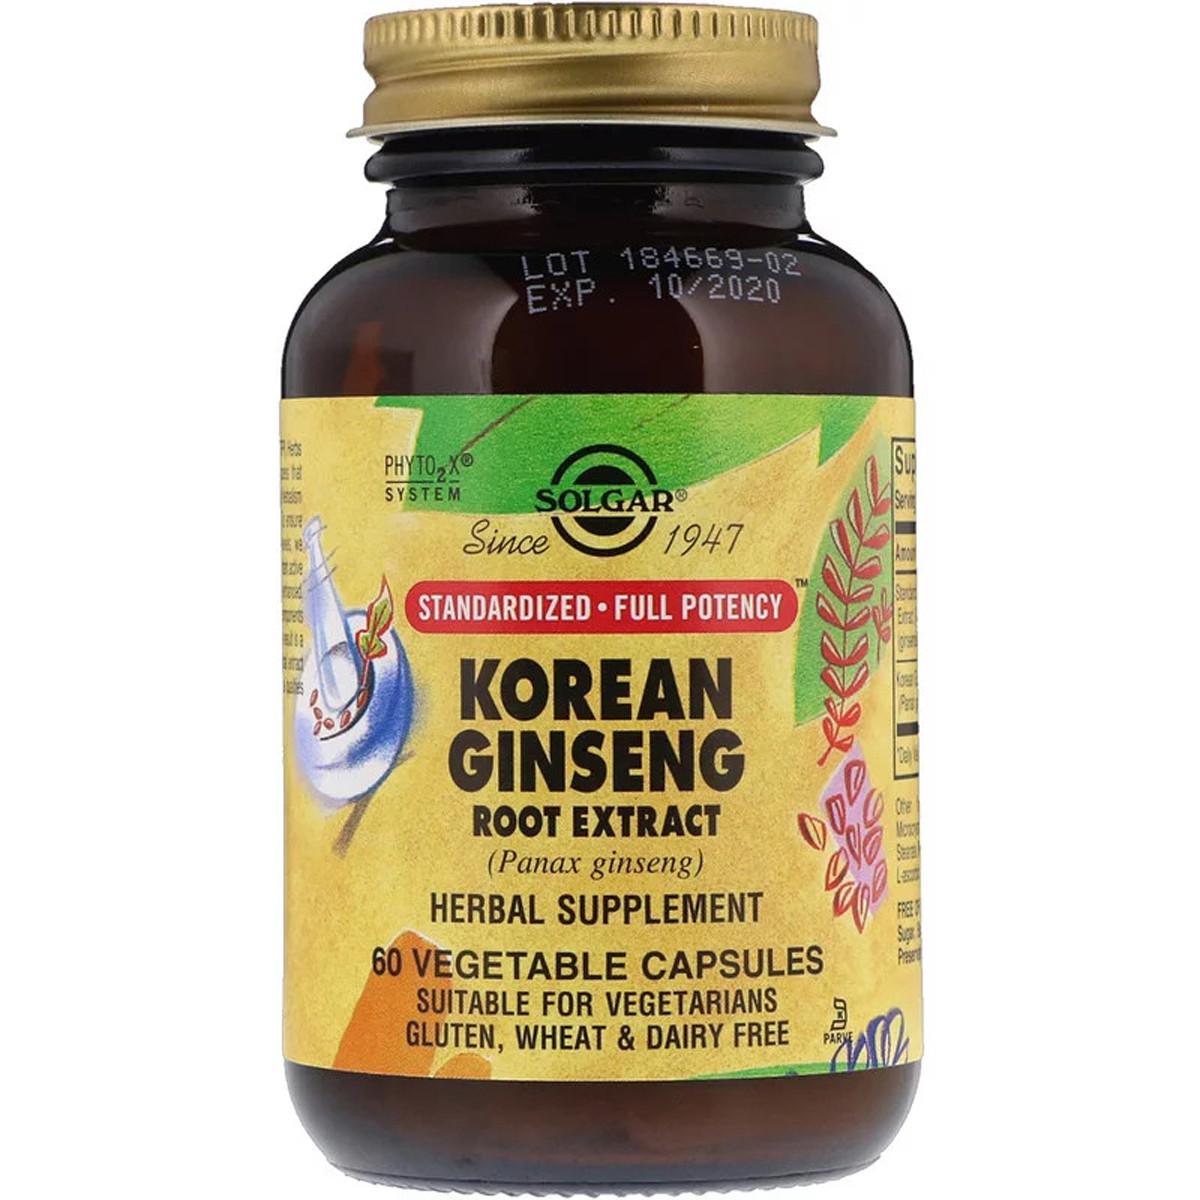 Корень Женьшеня (Экстракт), Korean Ginseng Root Extract, Solgar, 60 капсул